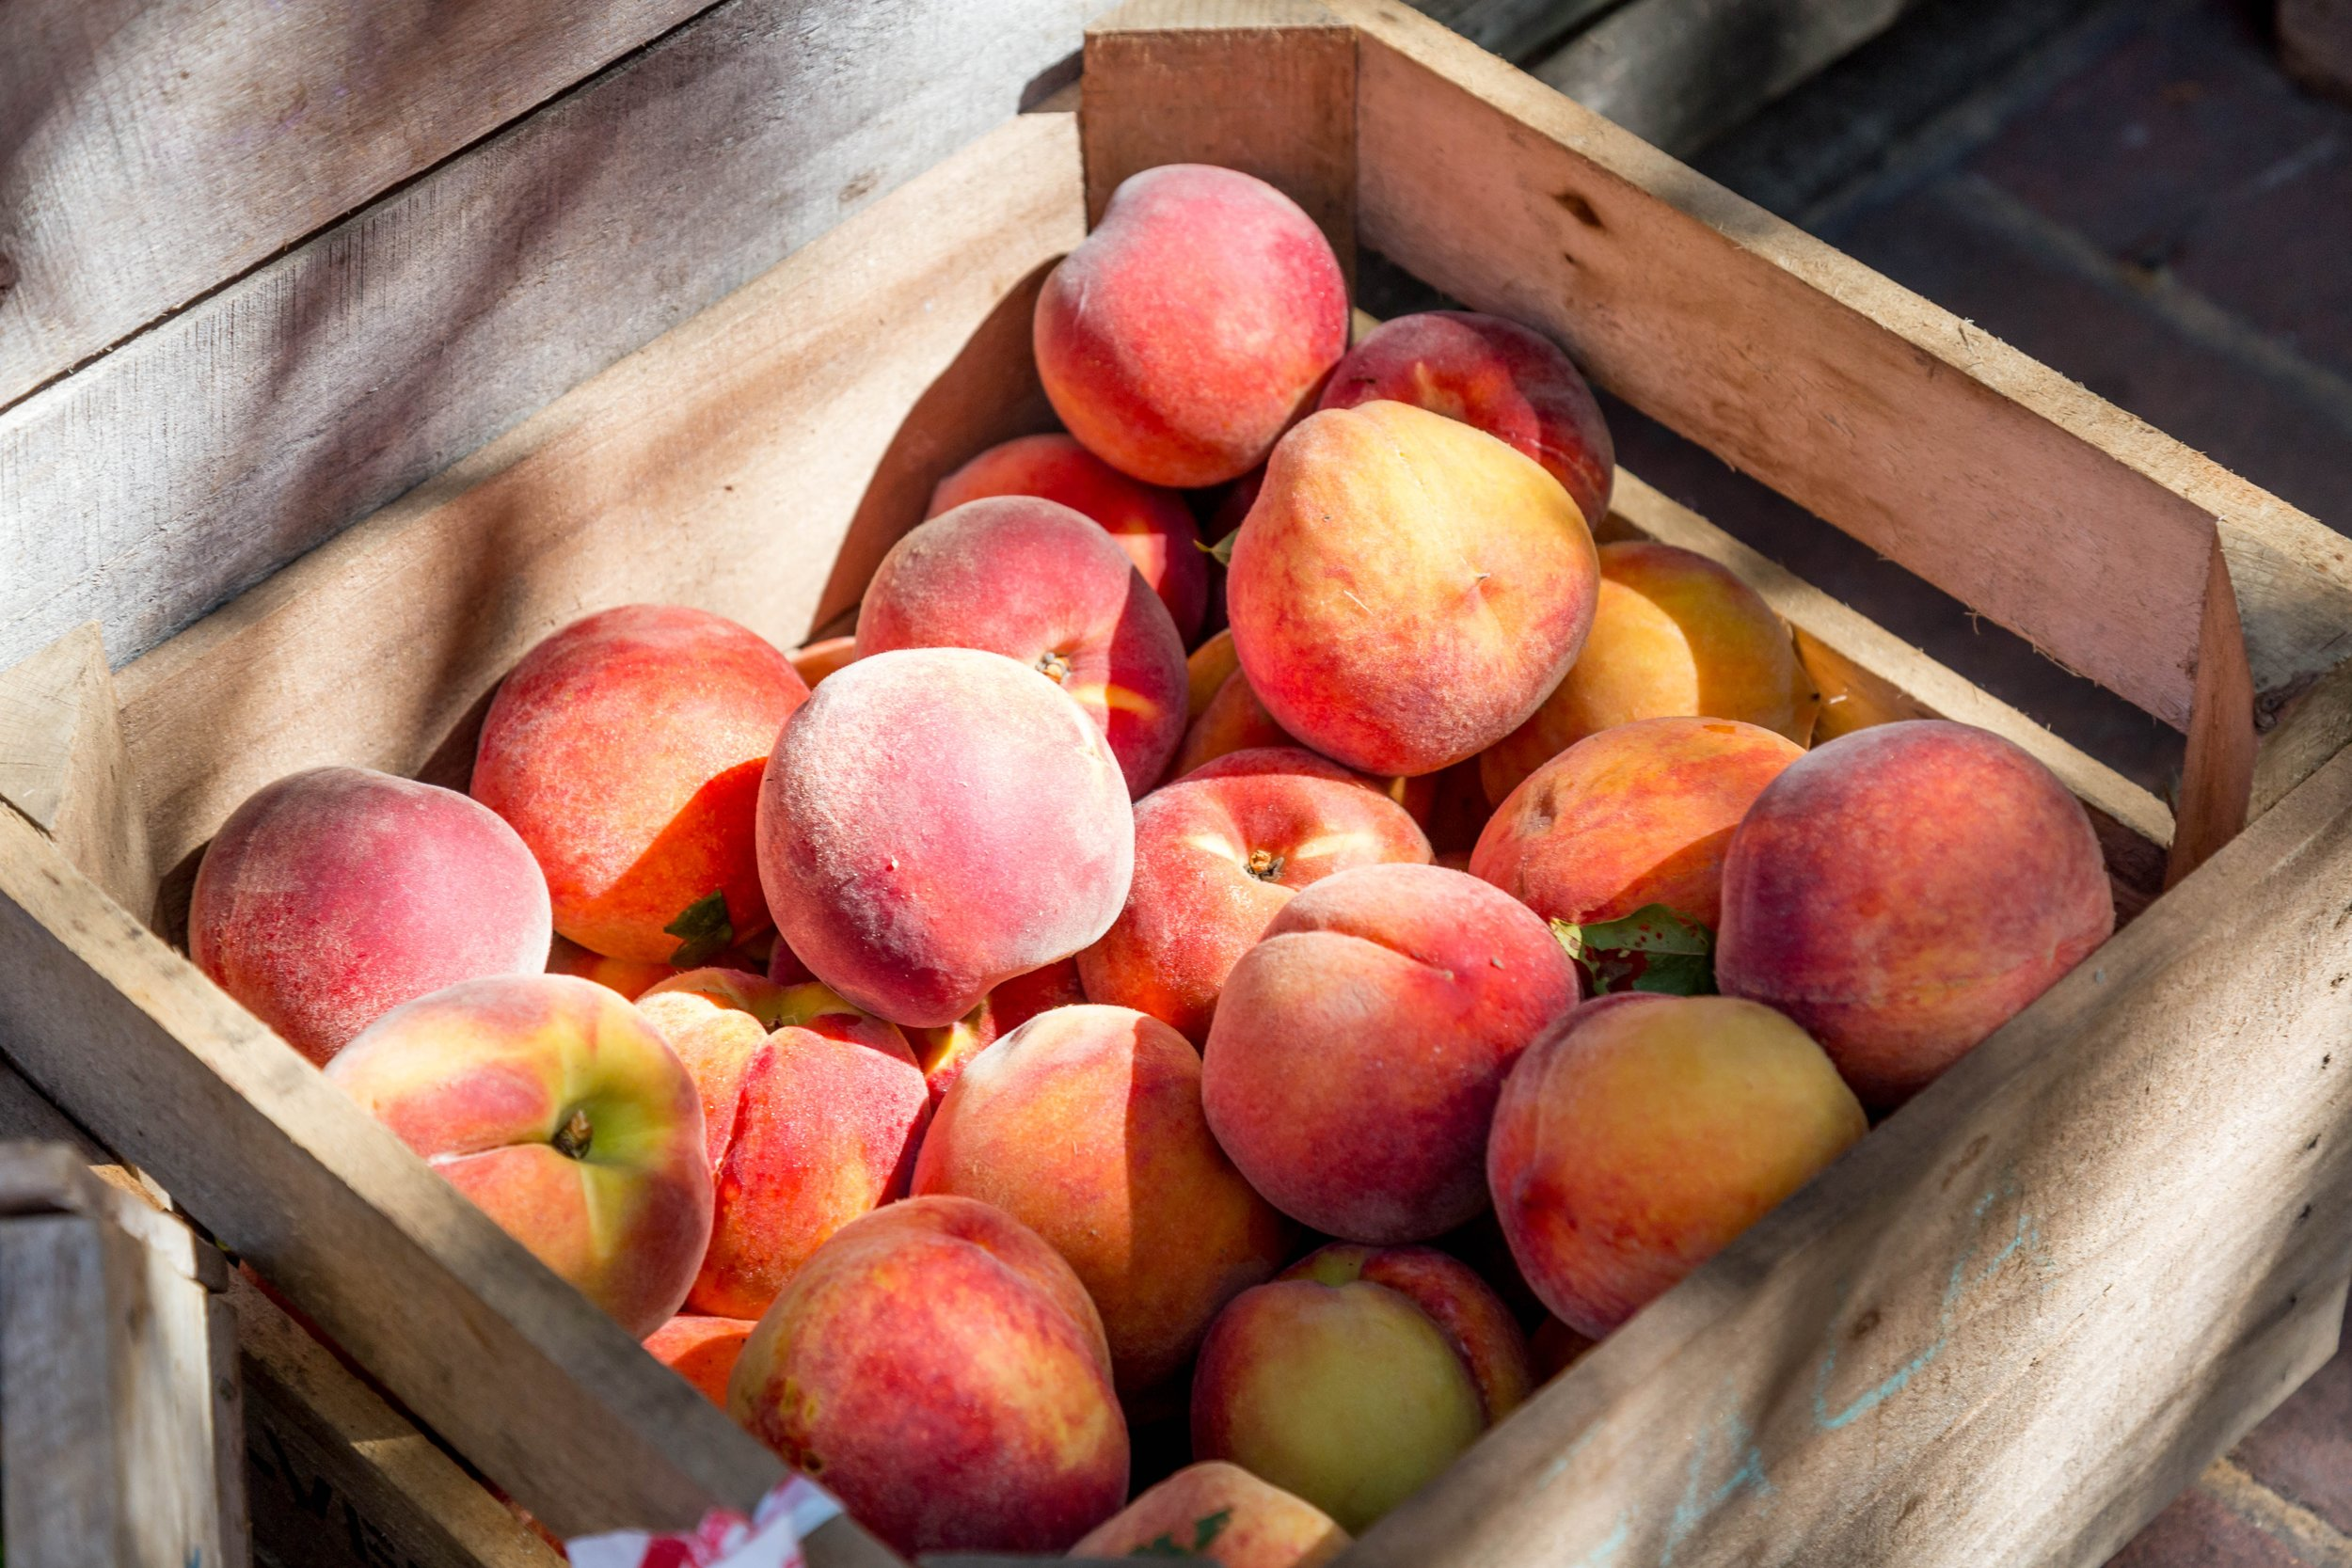 7. Peaches -